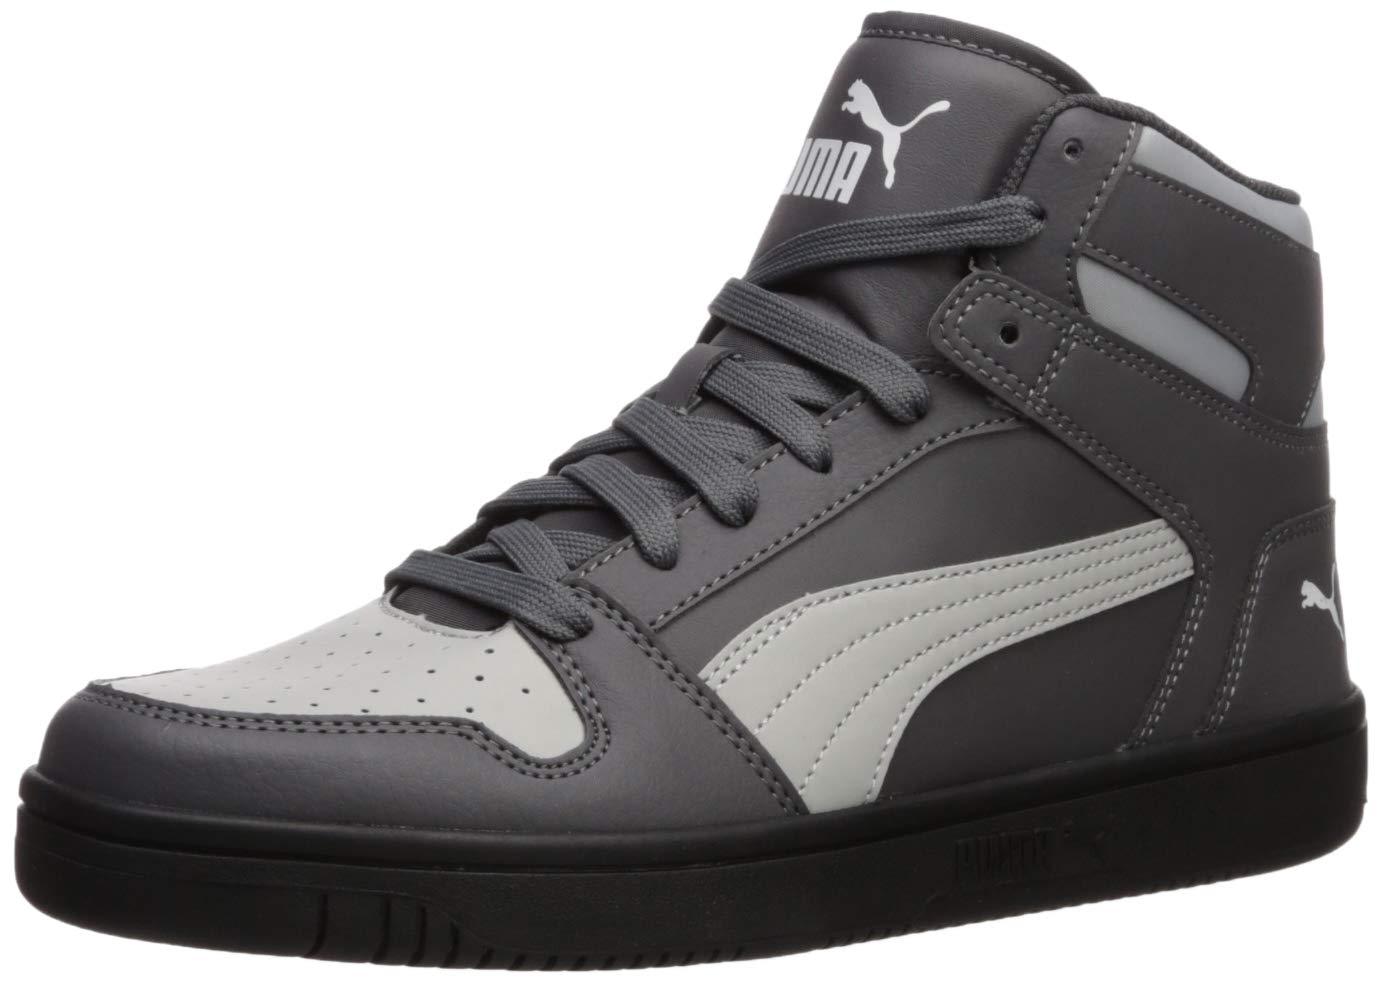 PUMA Rebound Layup Sneaker, Castlerock-High Rise White Black, 13 M ...